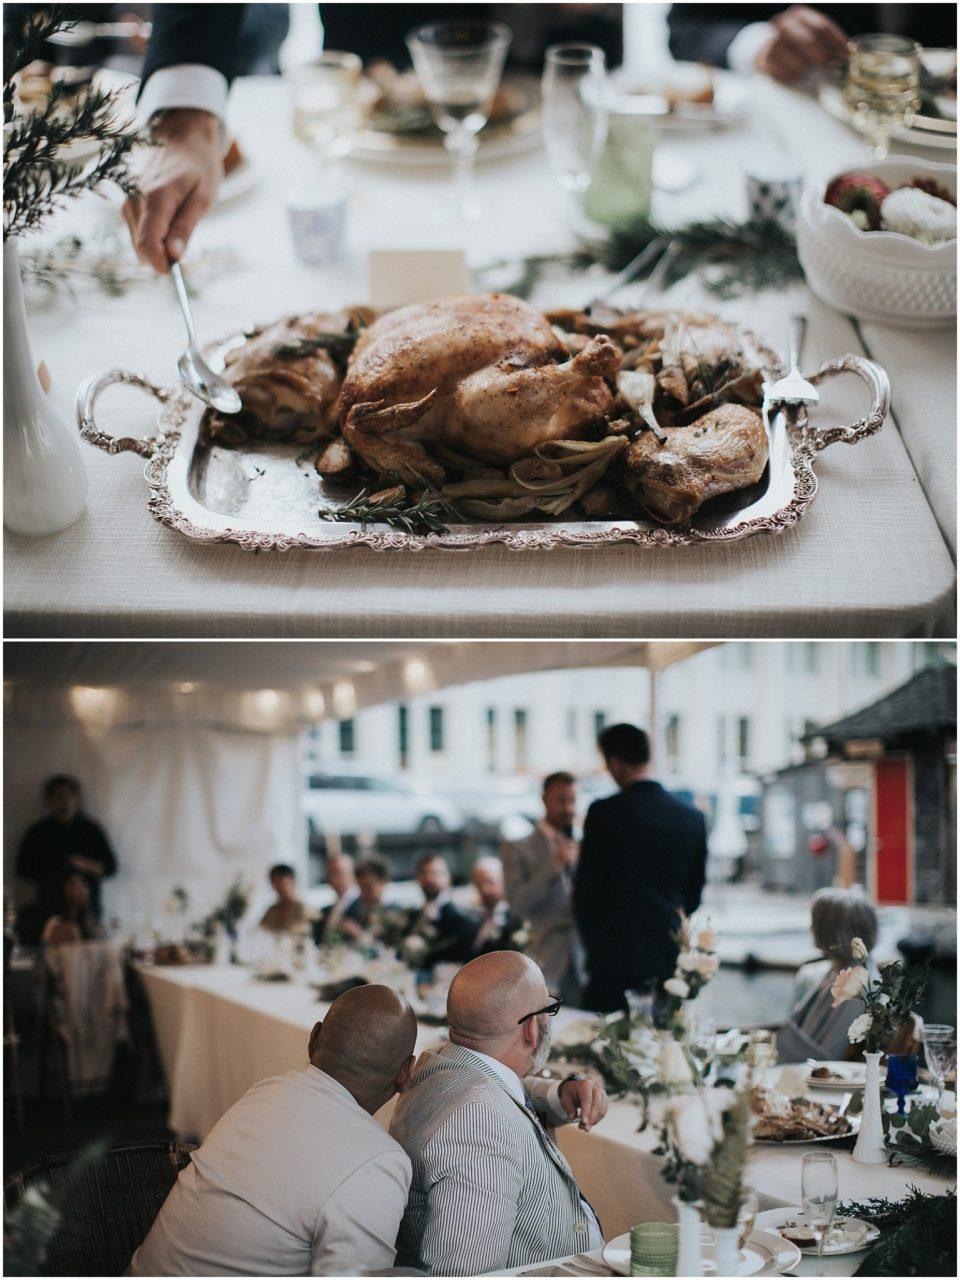 chadwick-tom-seattle-wedding (68 of 85)_seattle wedding.jpg